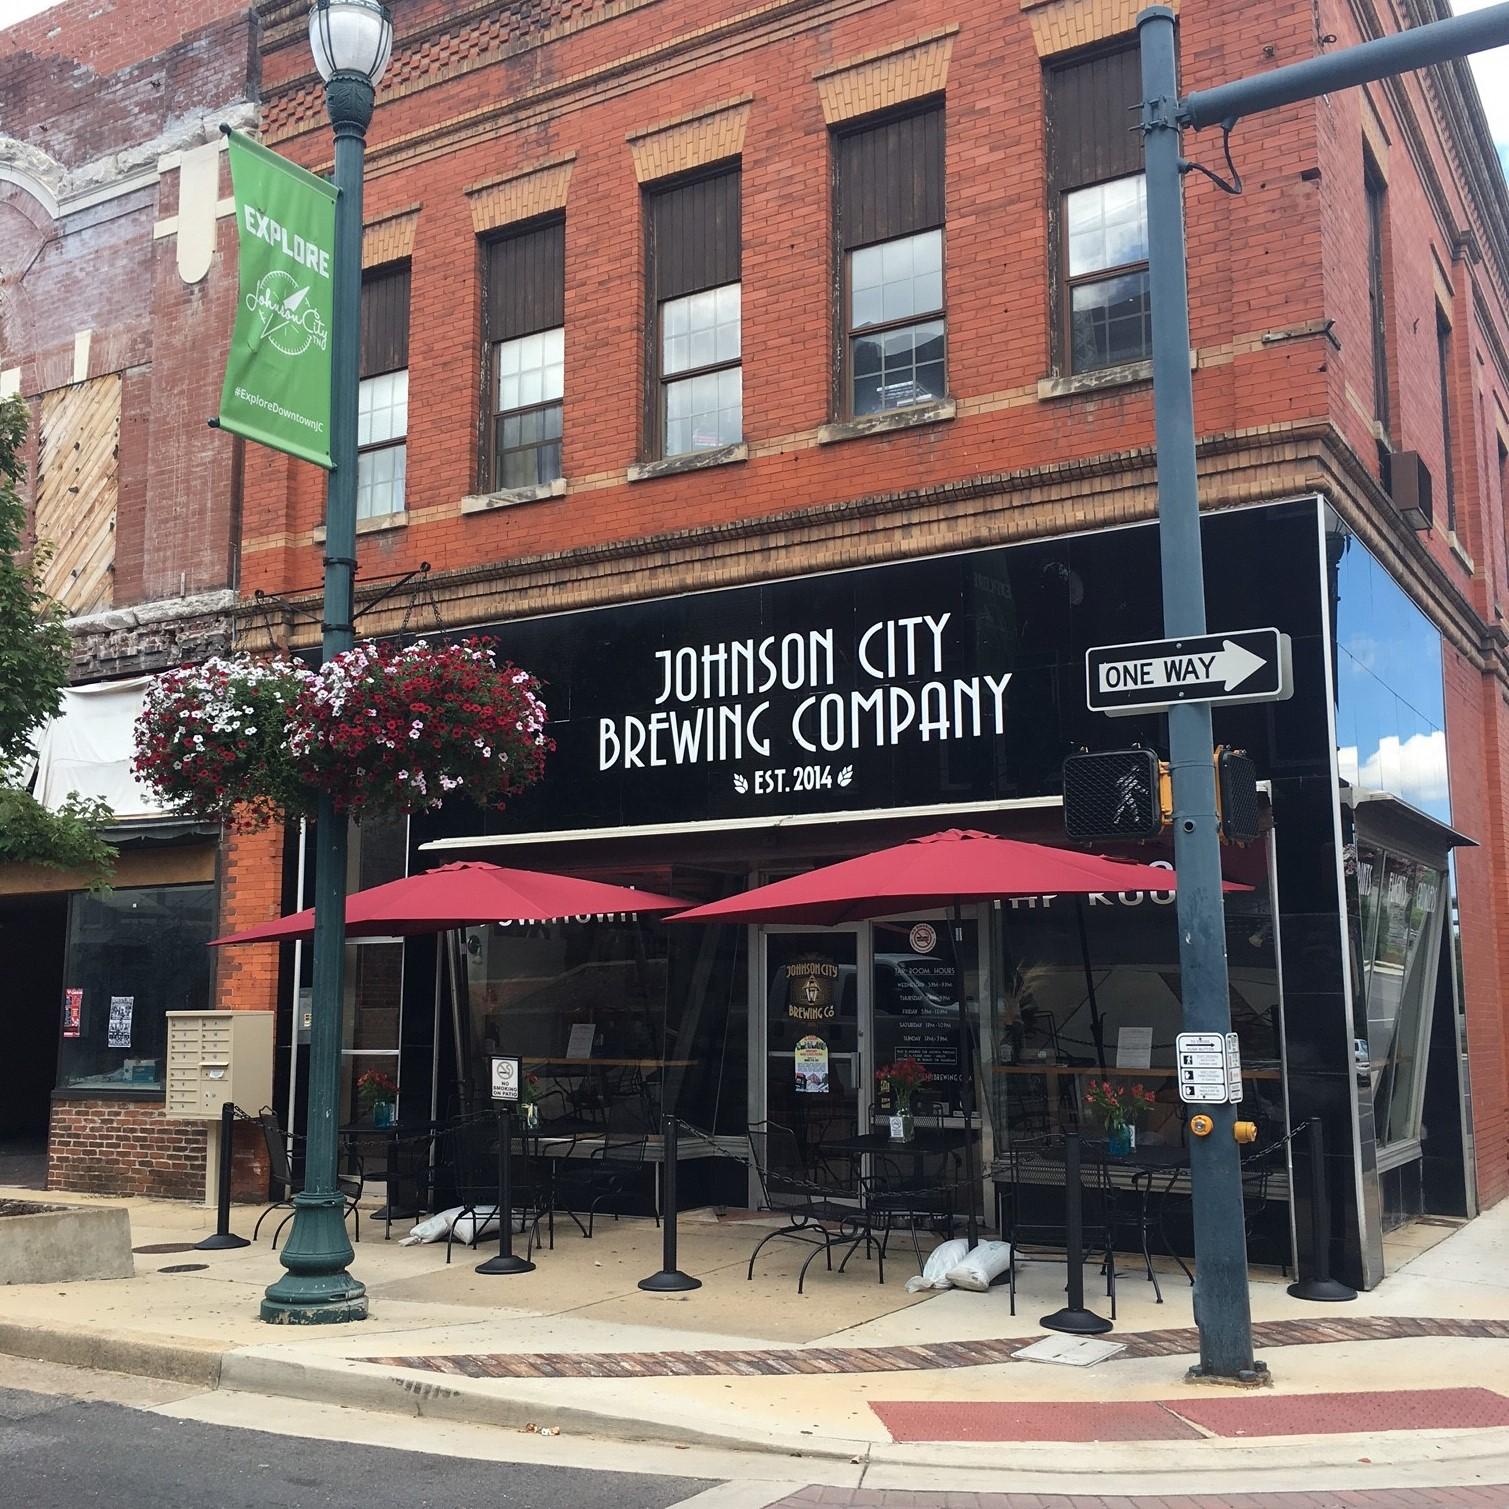 Johnson City Convention & Visitors Bureau in Johnson City